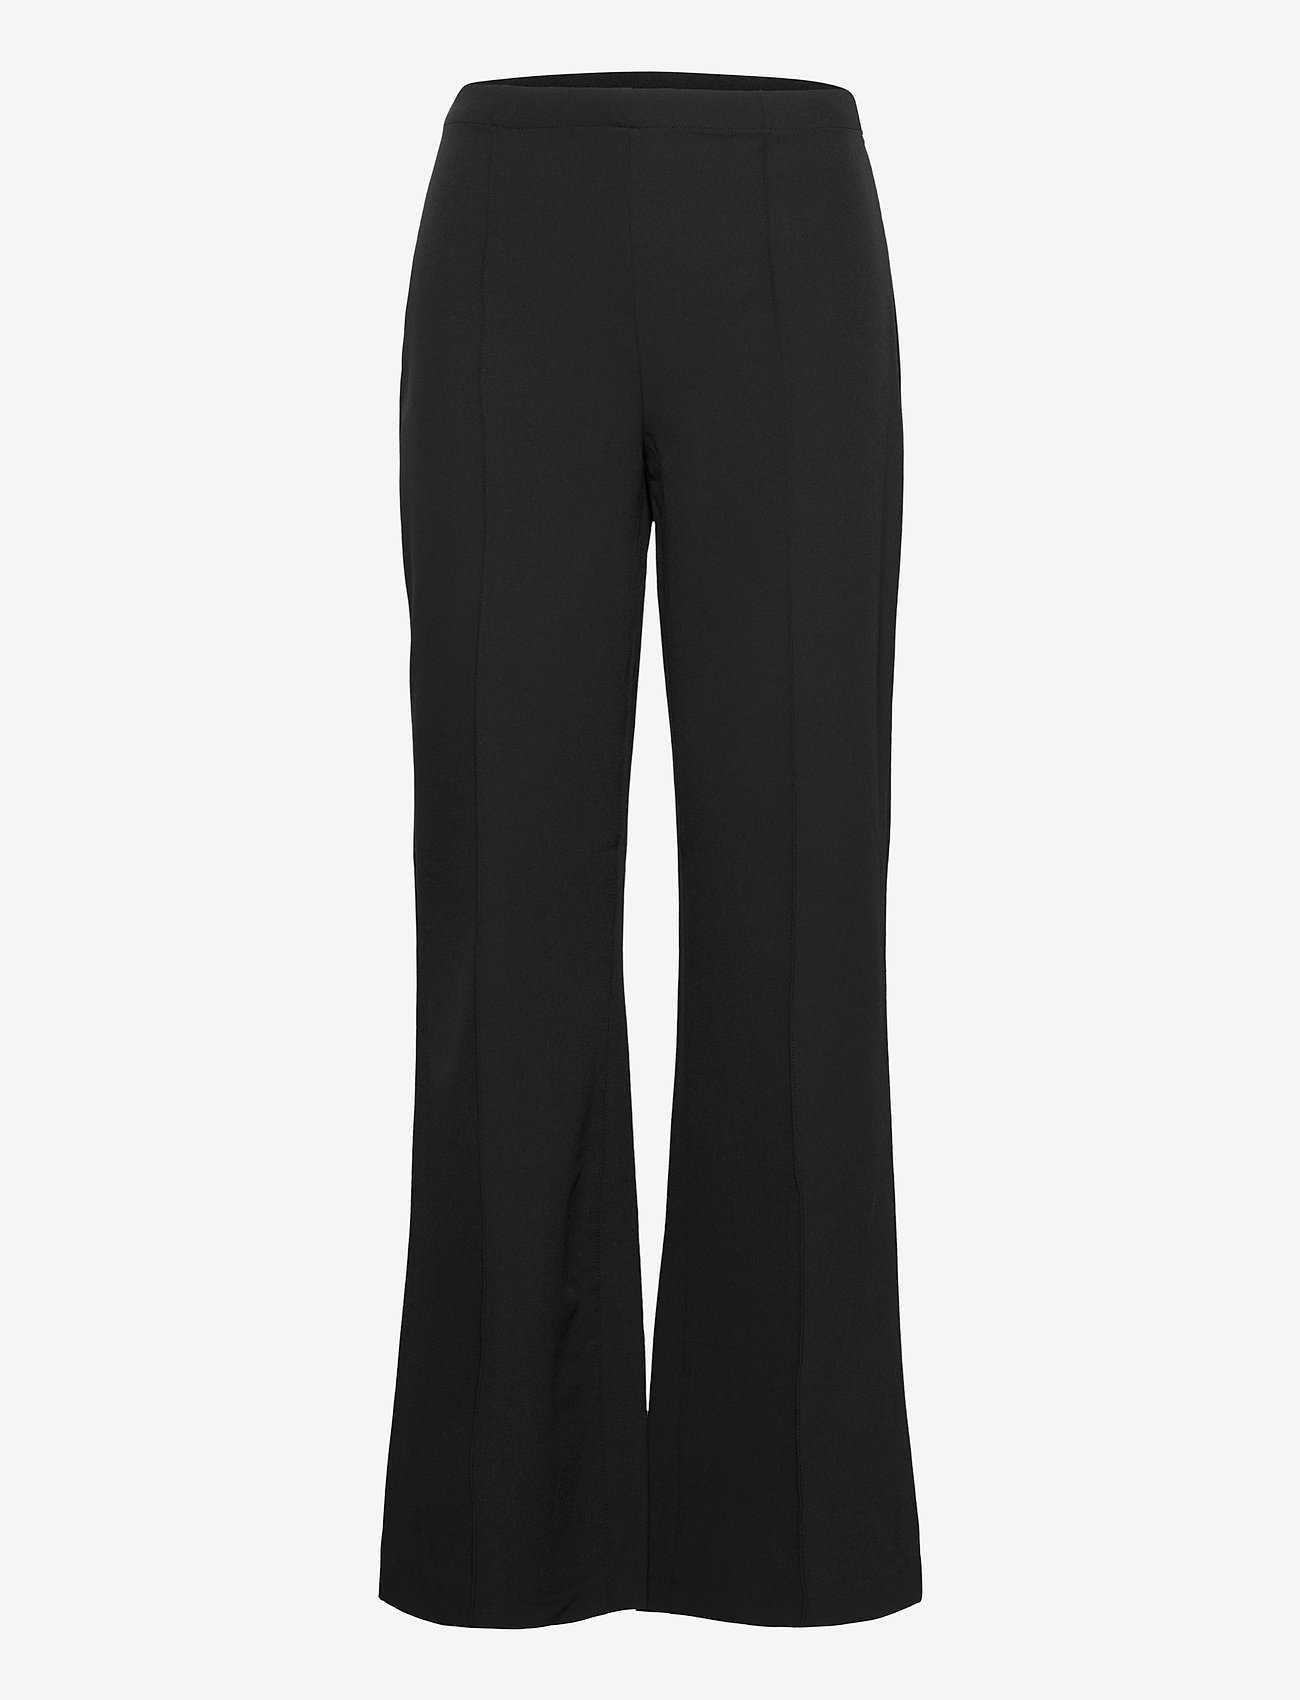 Mads Nørgaard - Sportina Tech Pirla - bukser med brede ben - black - 0